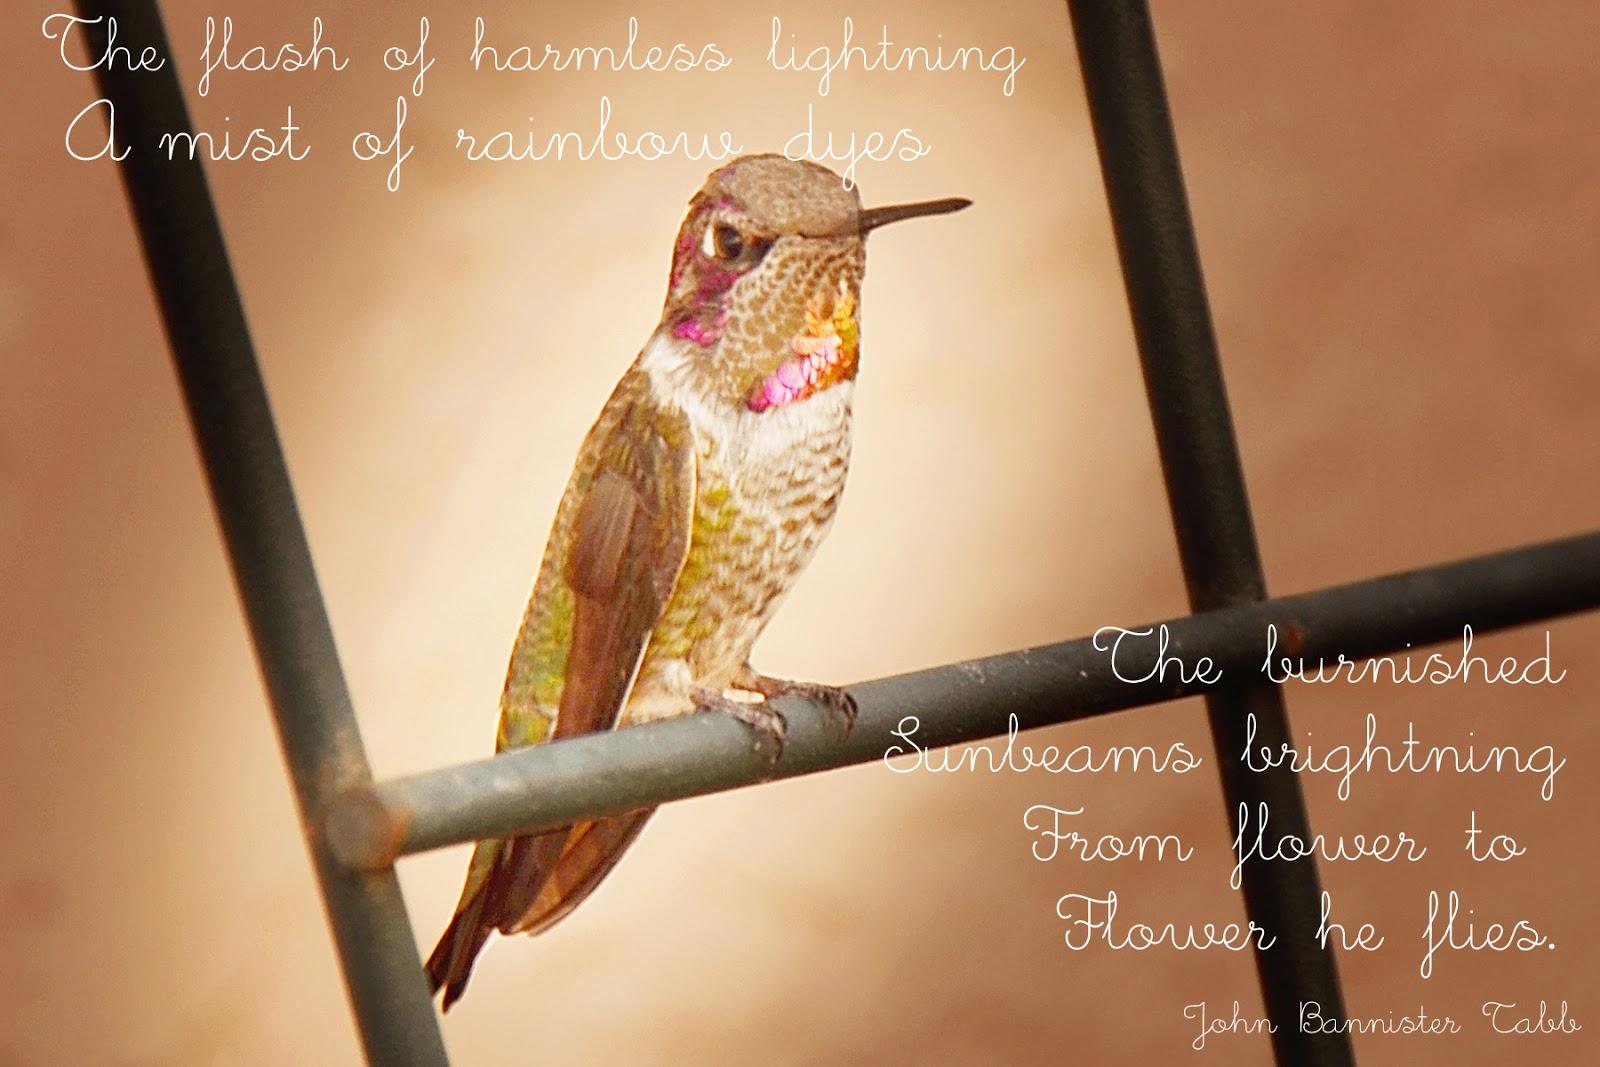 hummingbird images and quotes love quotesgram